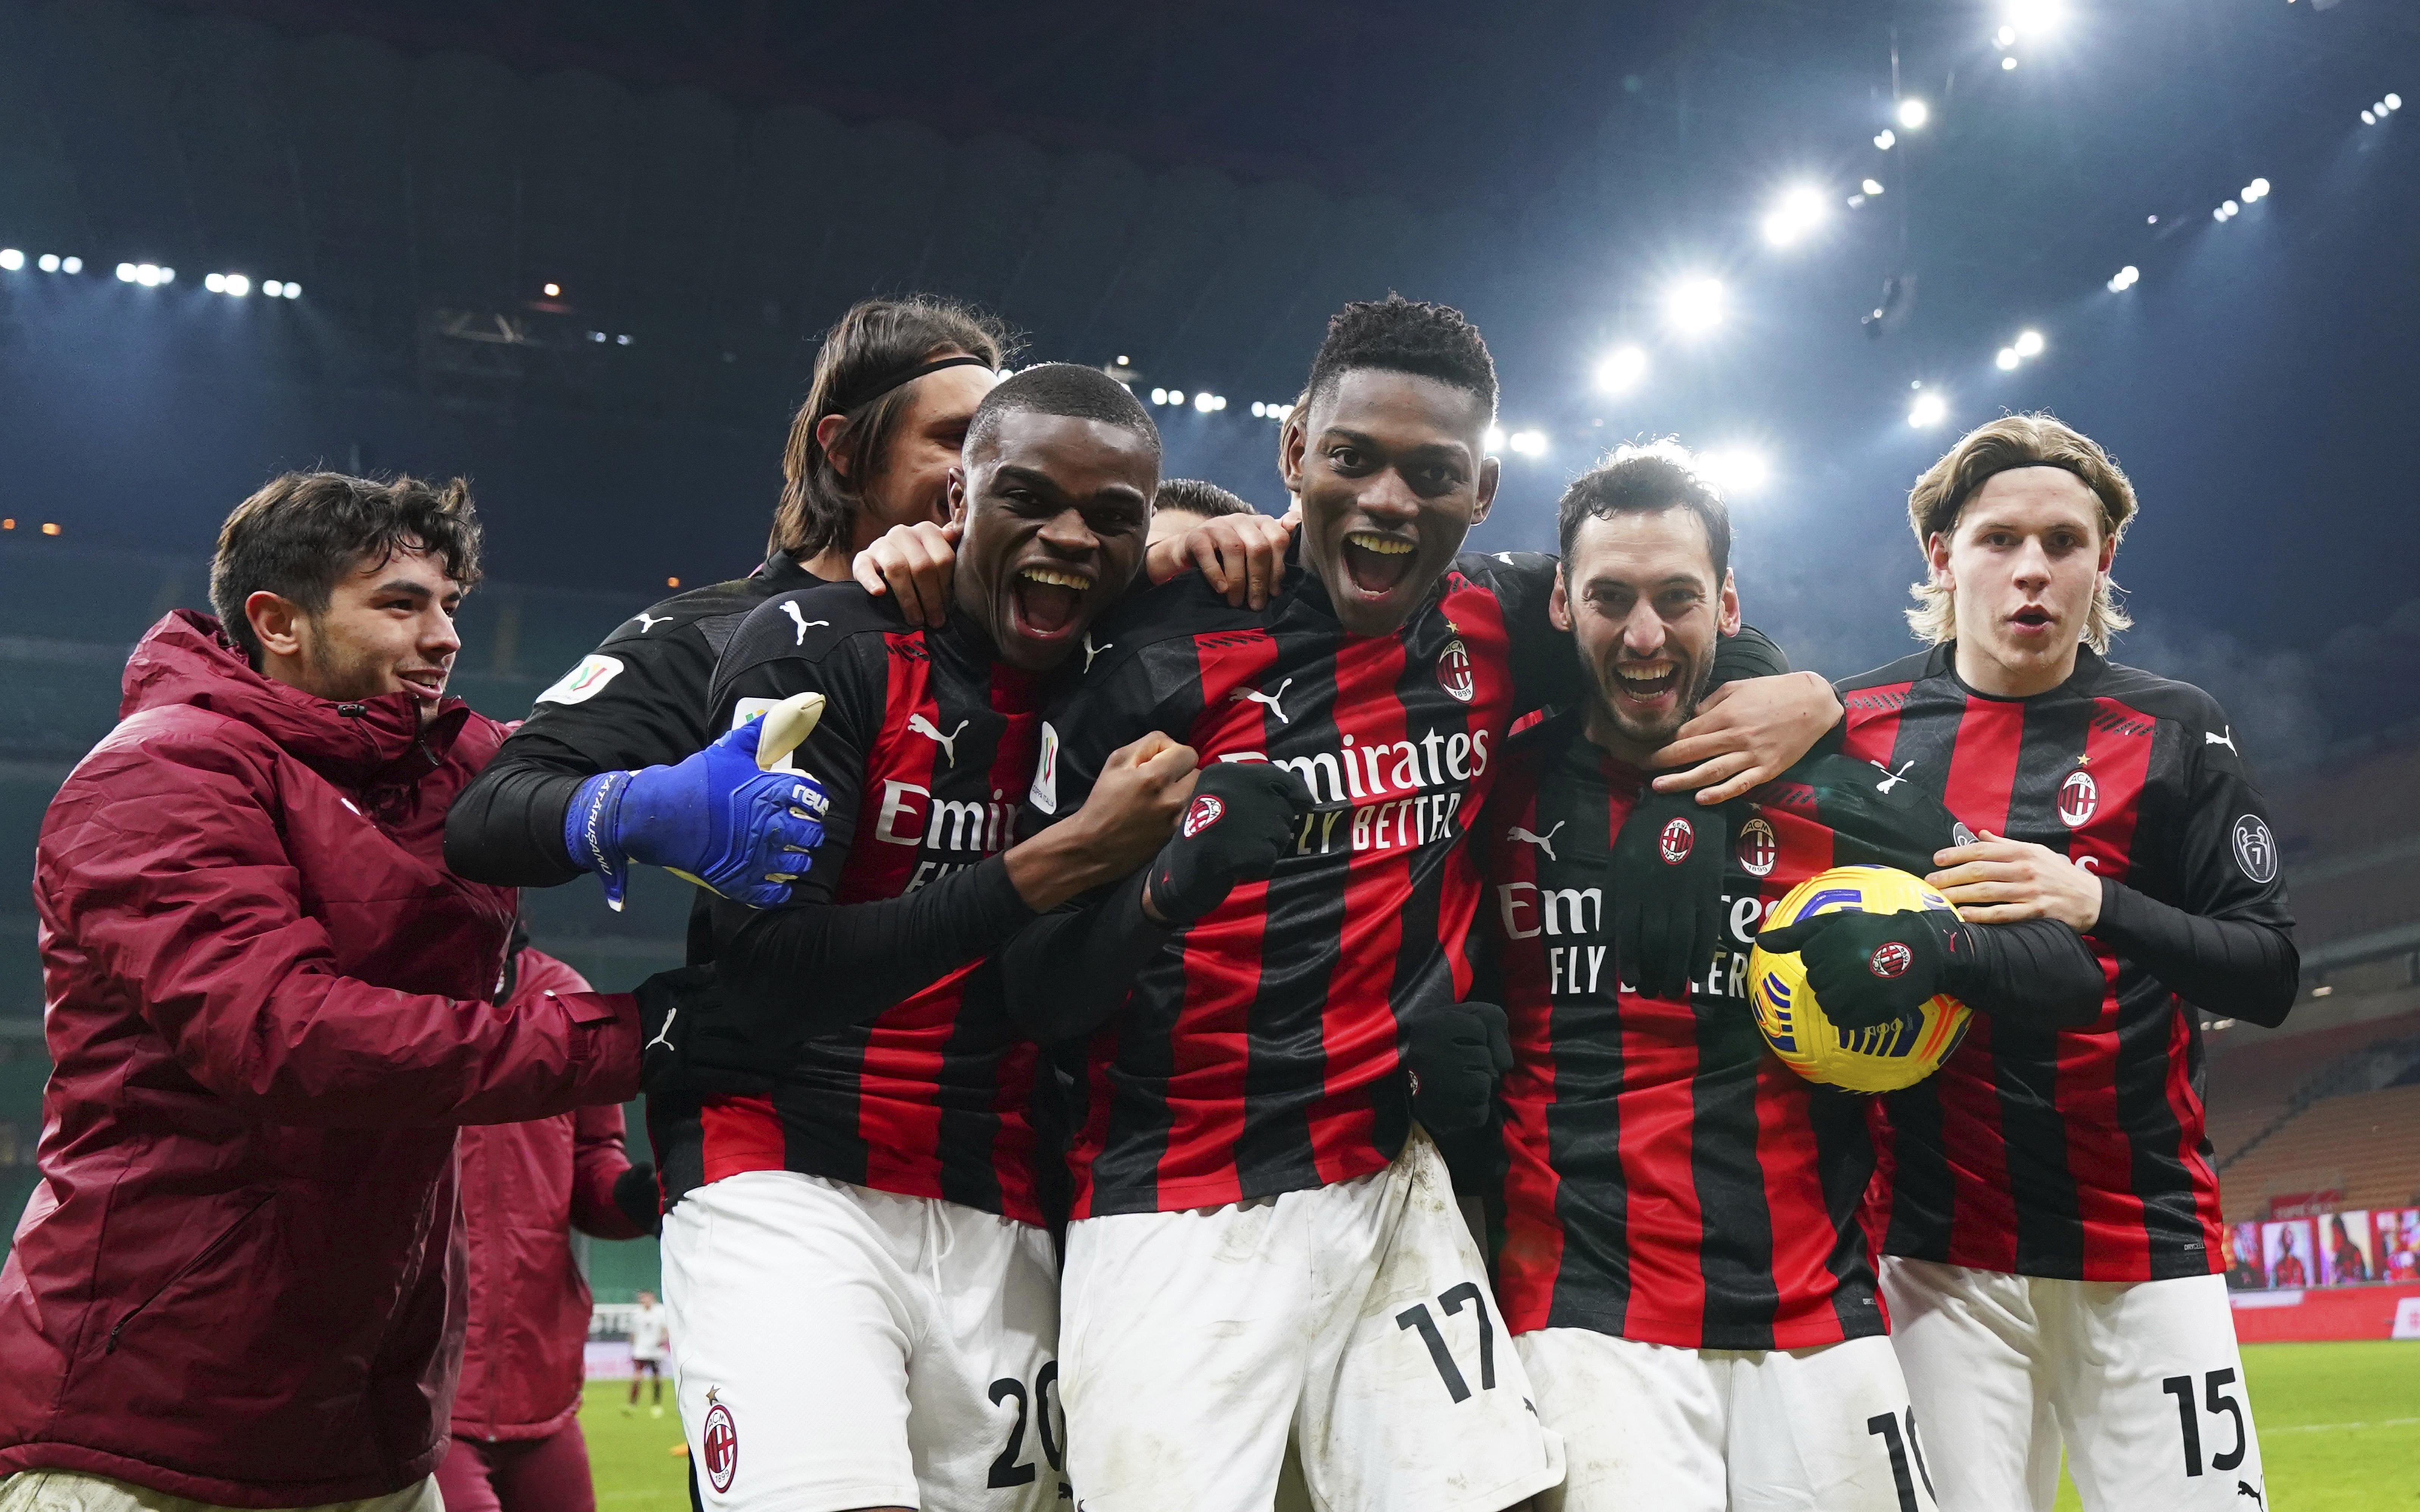 Ac Milan Vs Atalanta Live Stream 1 23 21 Watch Serie A Online Time Usa Tv Channel Nj Com